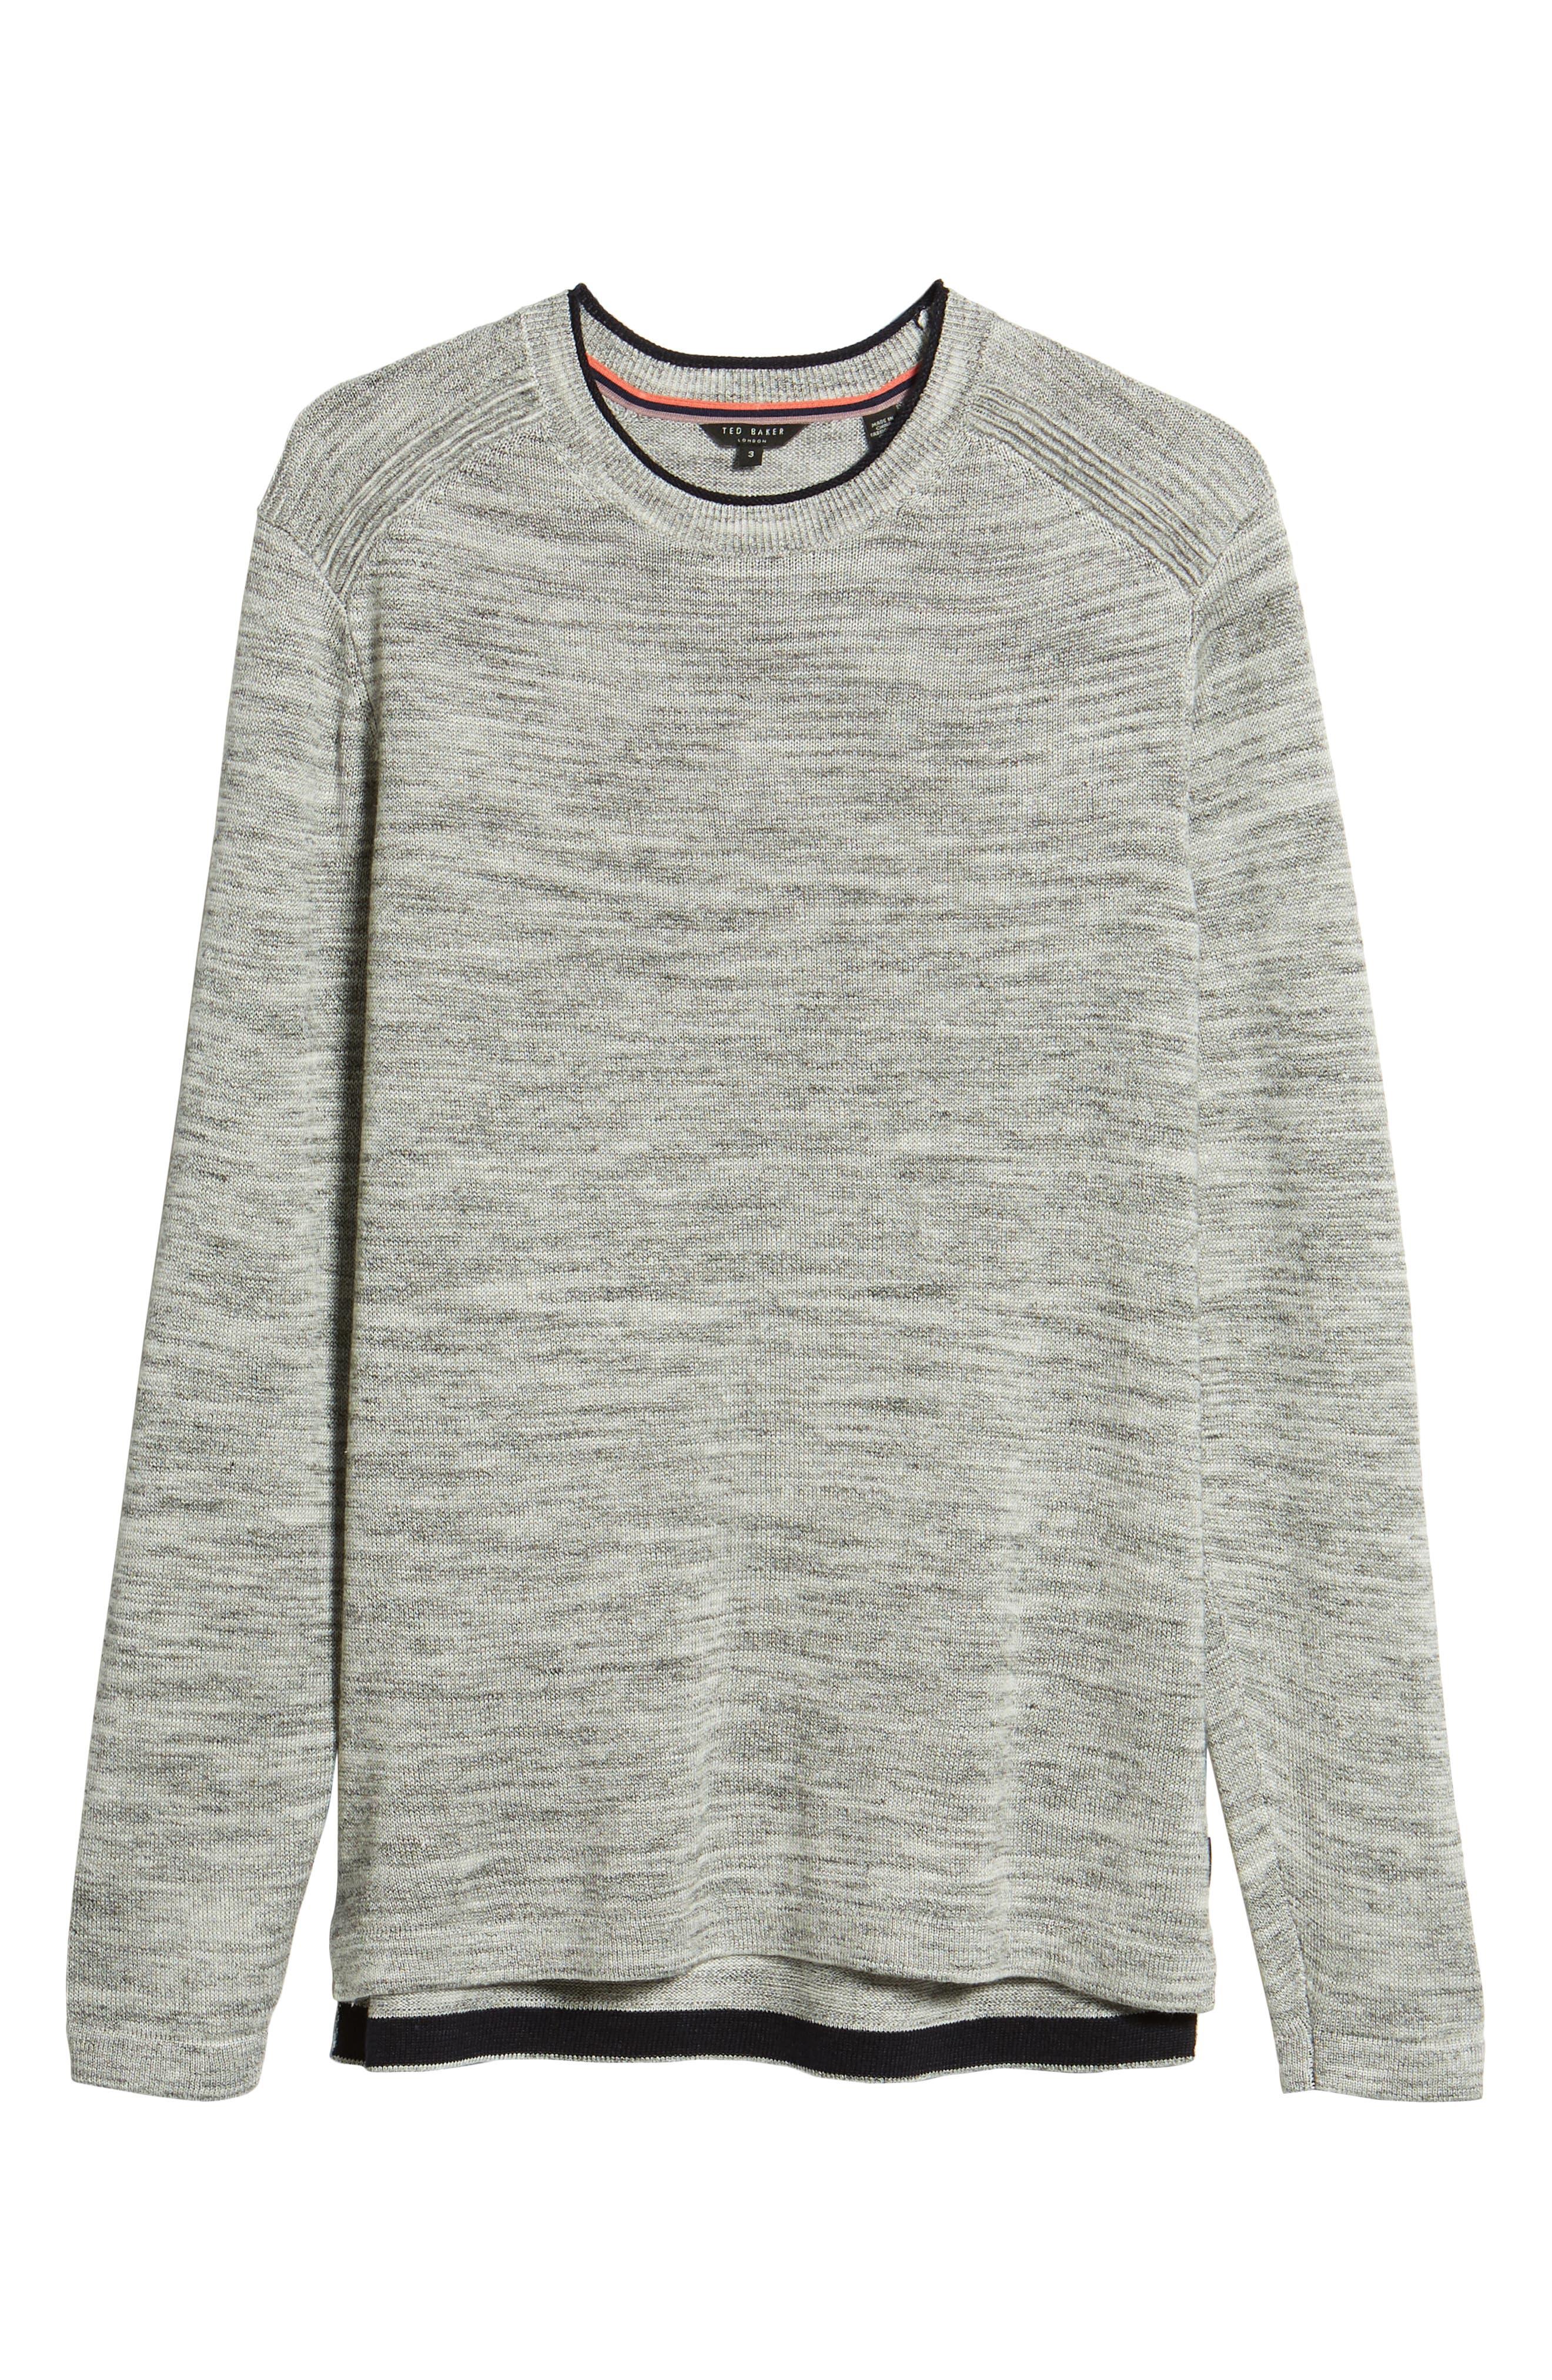 Inzone Crewneck Linen Blend Sweater,                             Alternate thumbnail 6, color,                             050